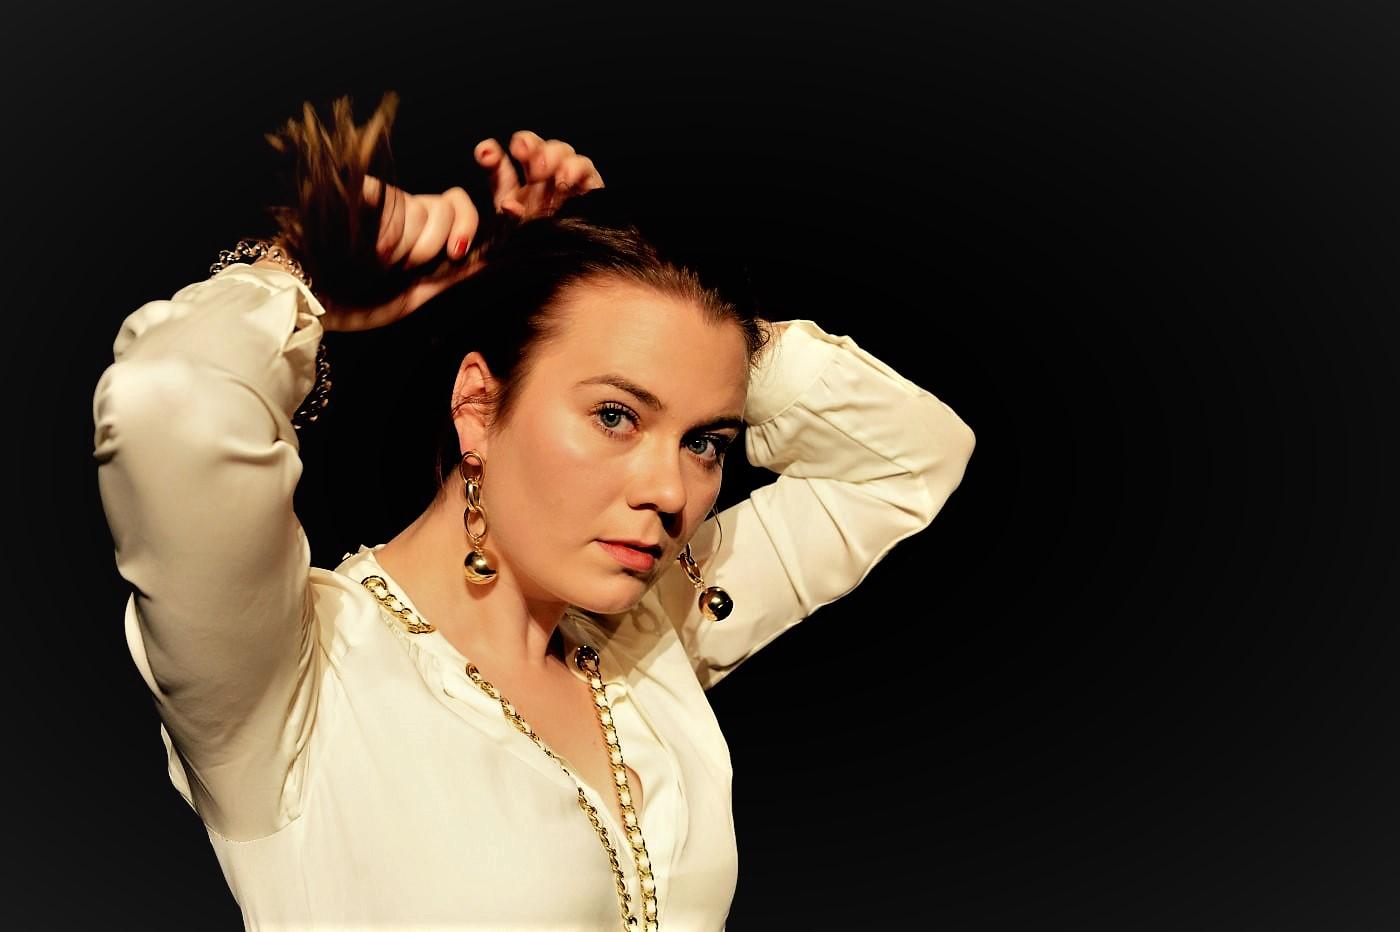 HofKultur - JazzIni Hausband feat. Charlotte Illinger